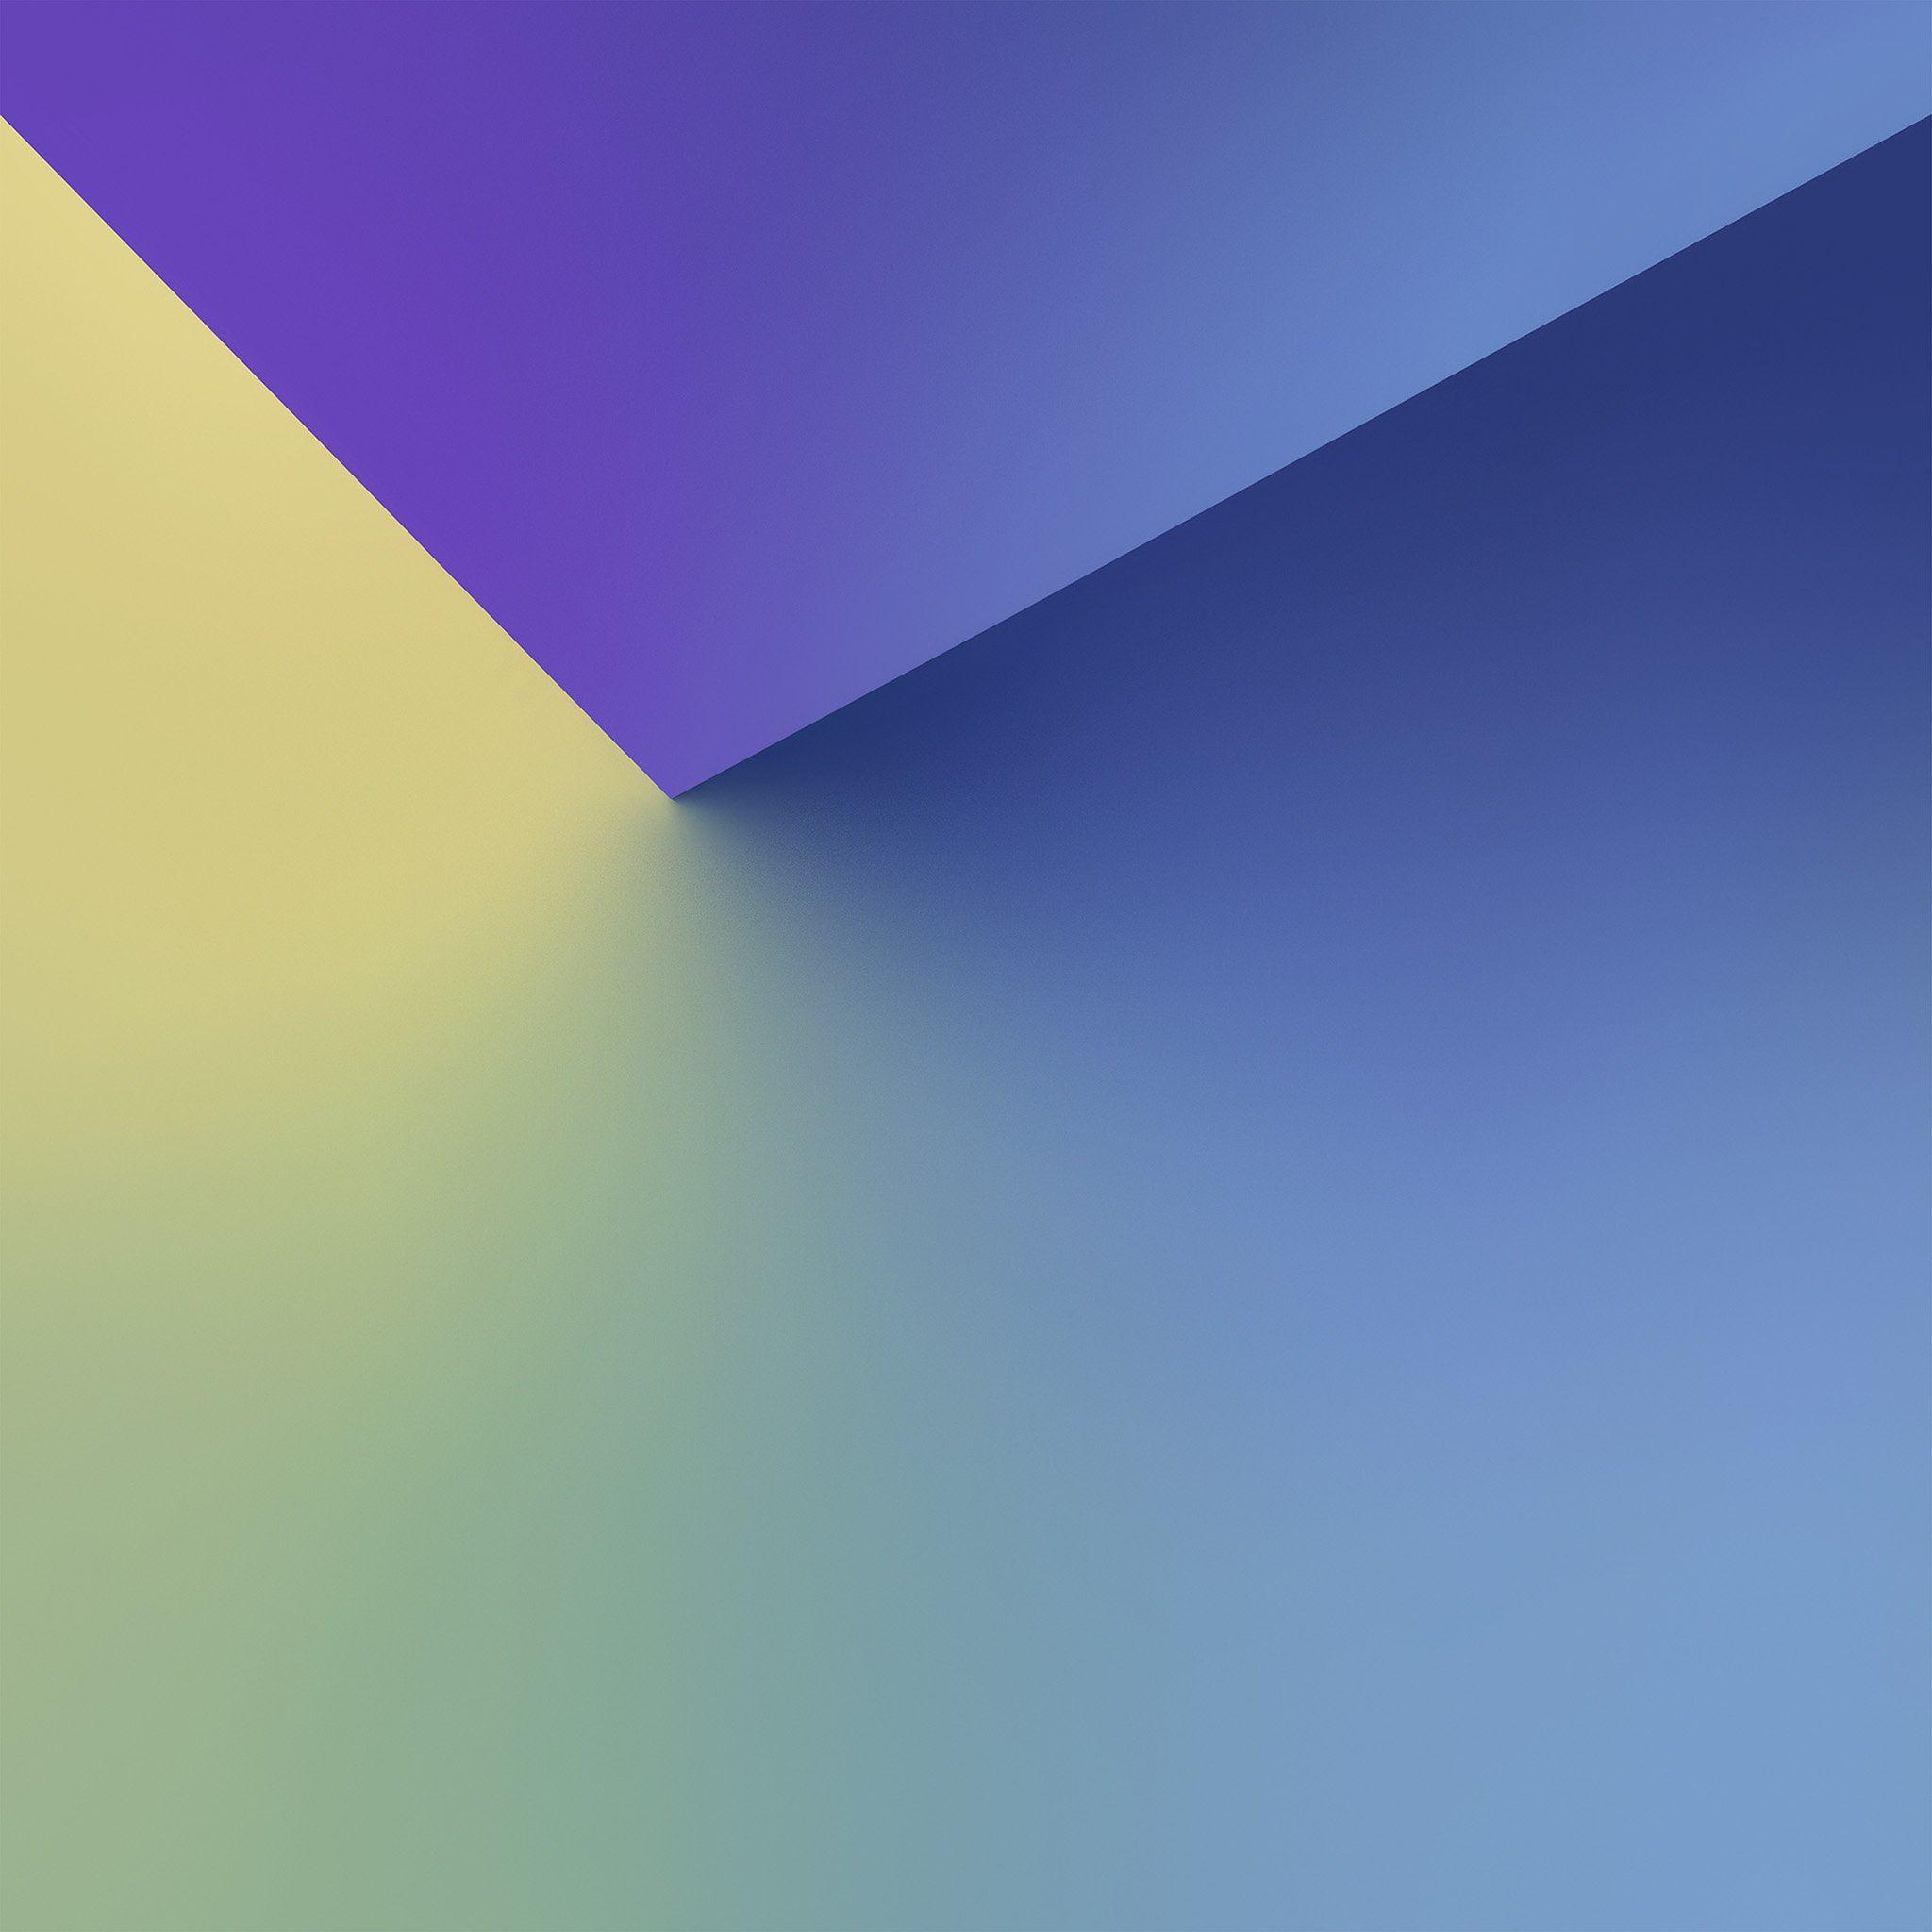 Art background blue pattern iPad Air wallpaper